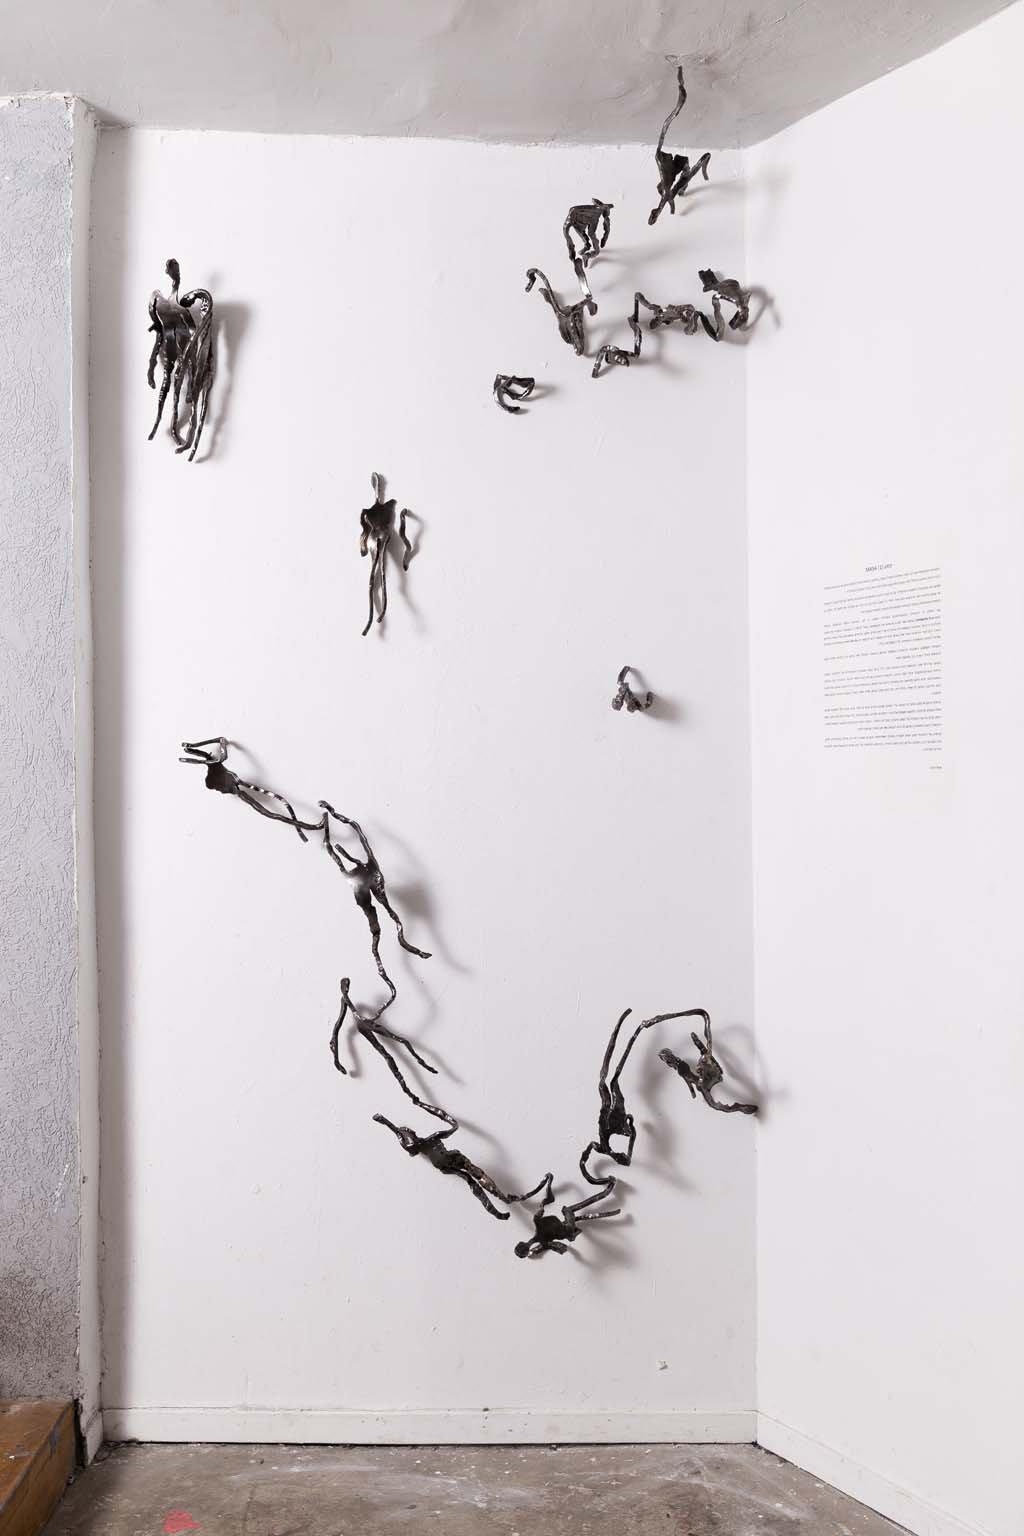 MASA [I] wall | 2019 |  Iron sculptures by Rami Ater